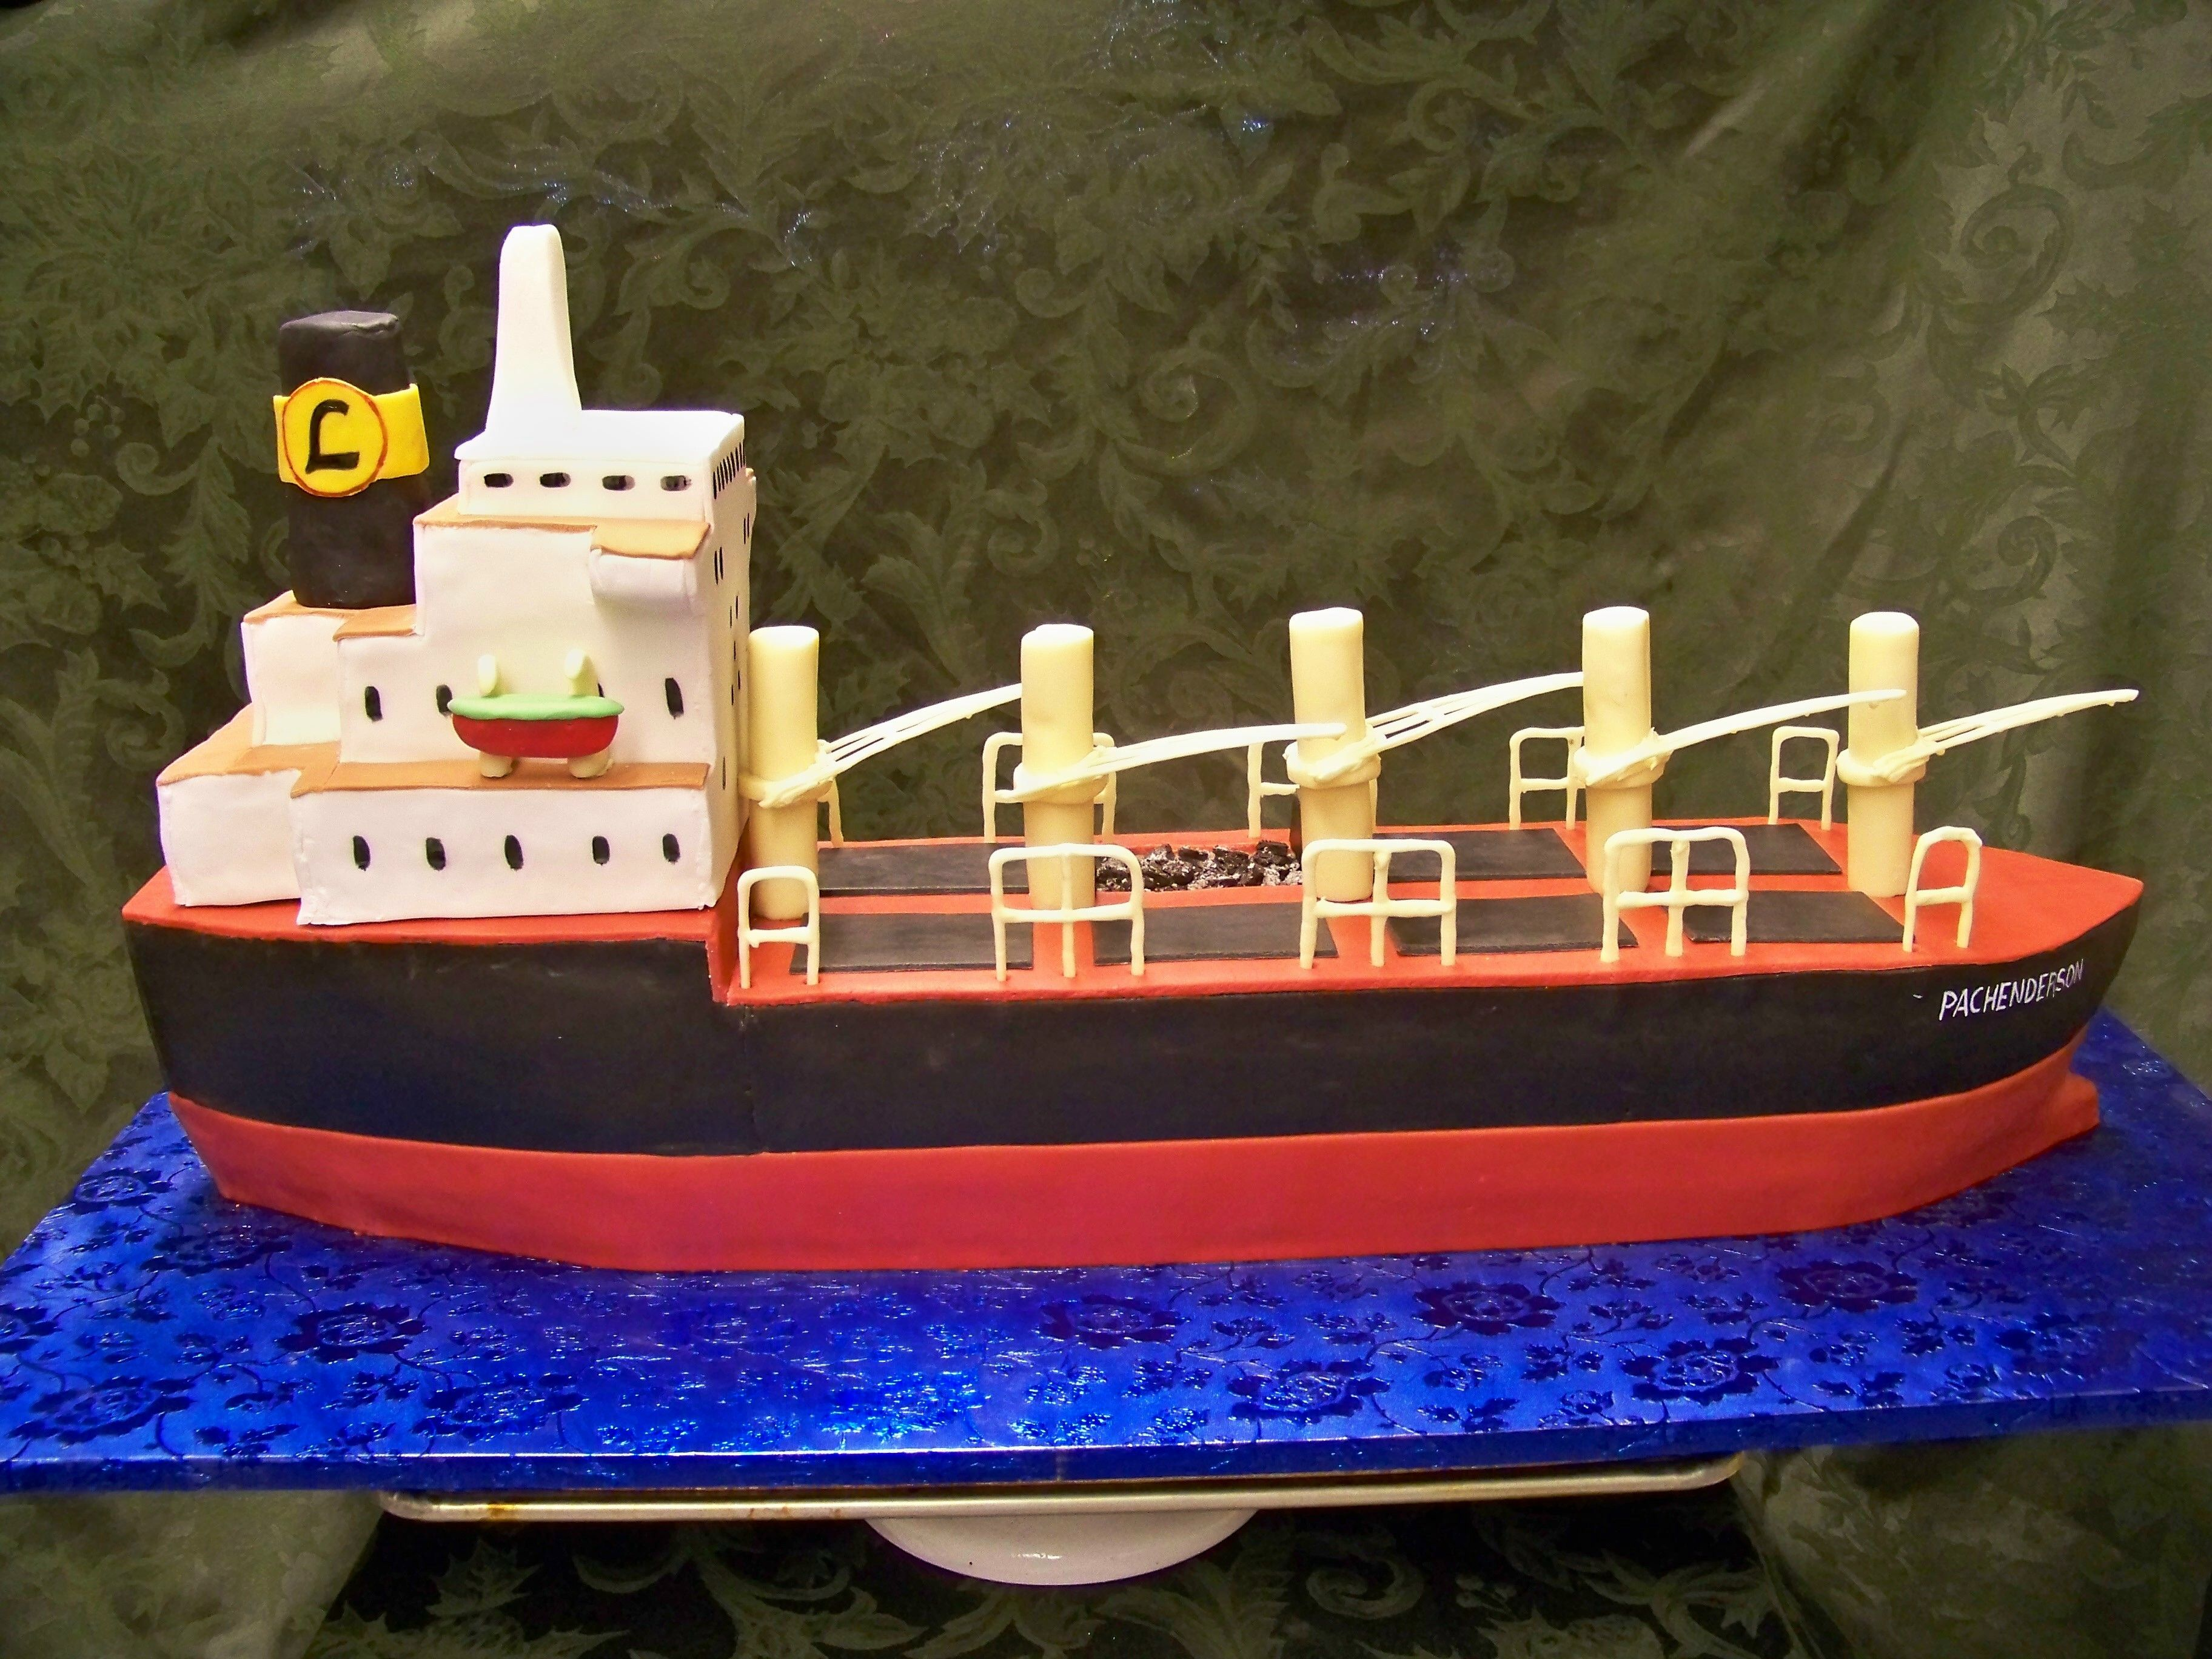 Tremendous Cargo Ship Cake With Images Cake Designs For Boy Eat Cake Funny Birthday Cards Online Inifofree Goldxyz